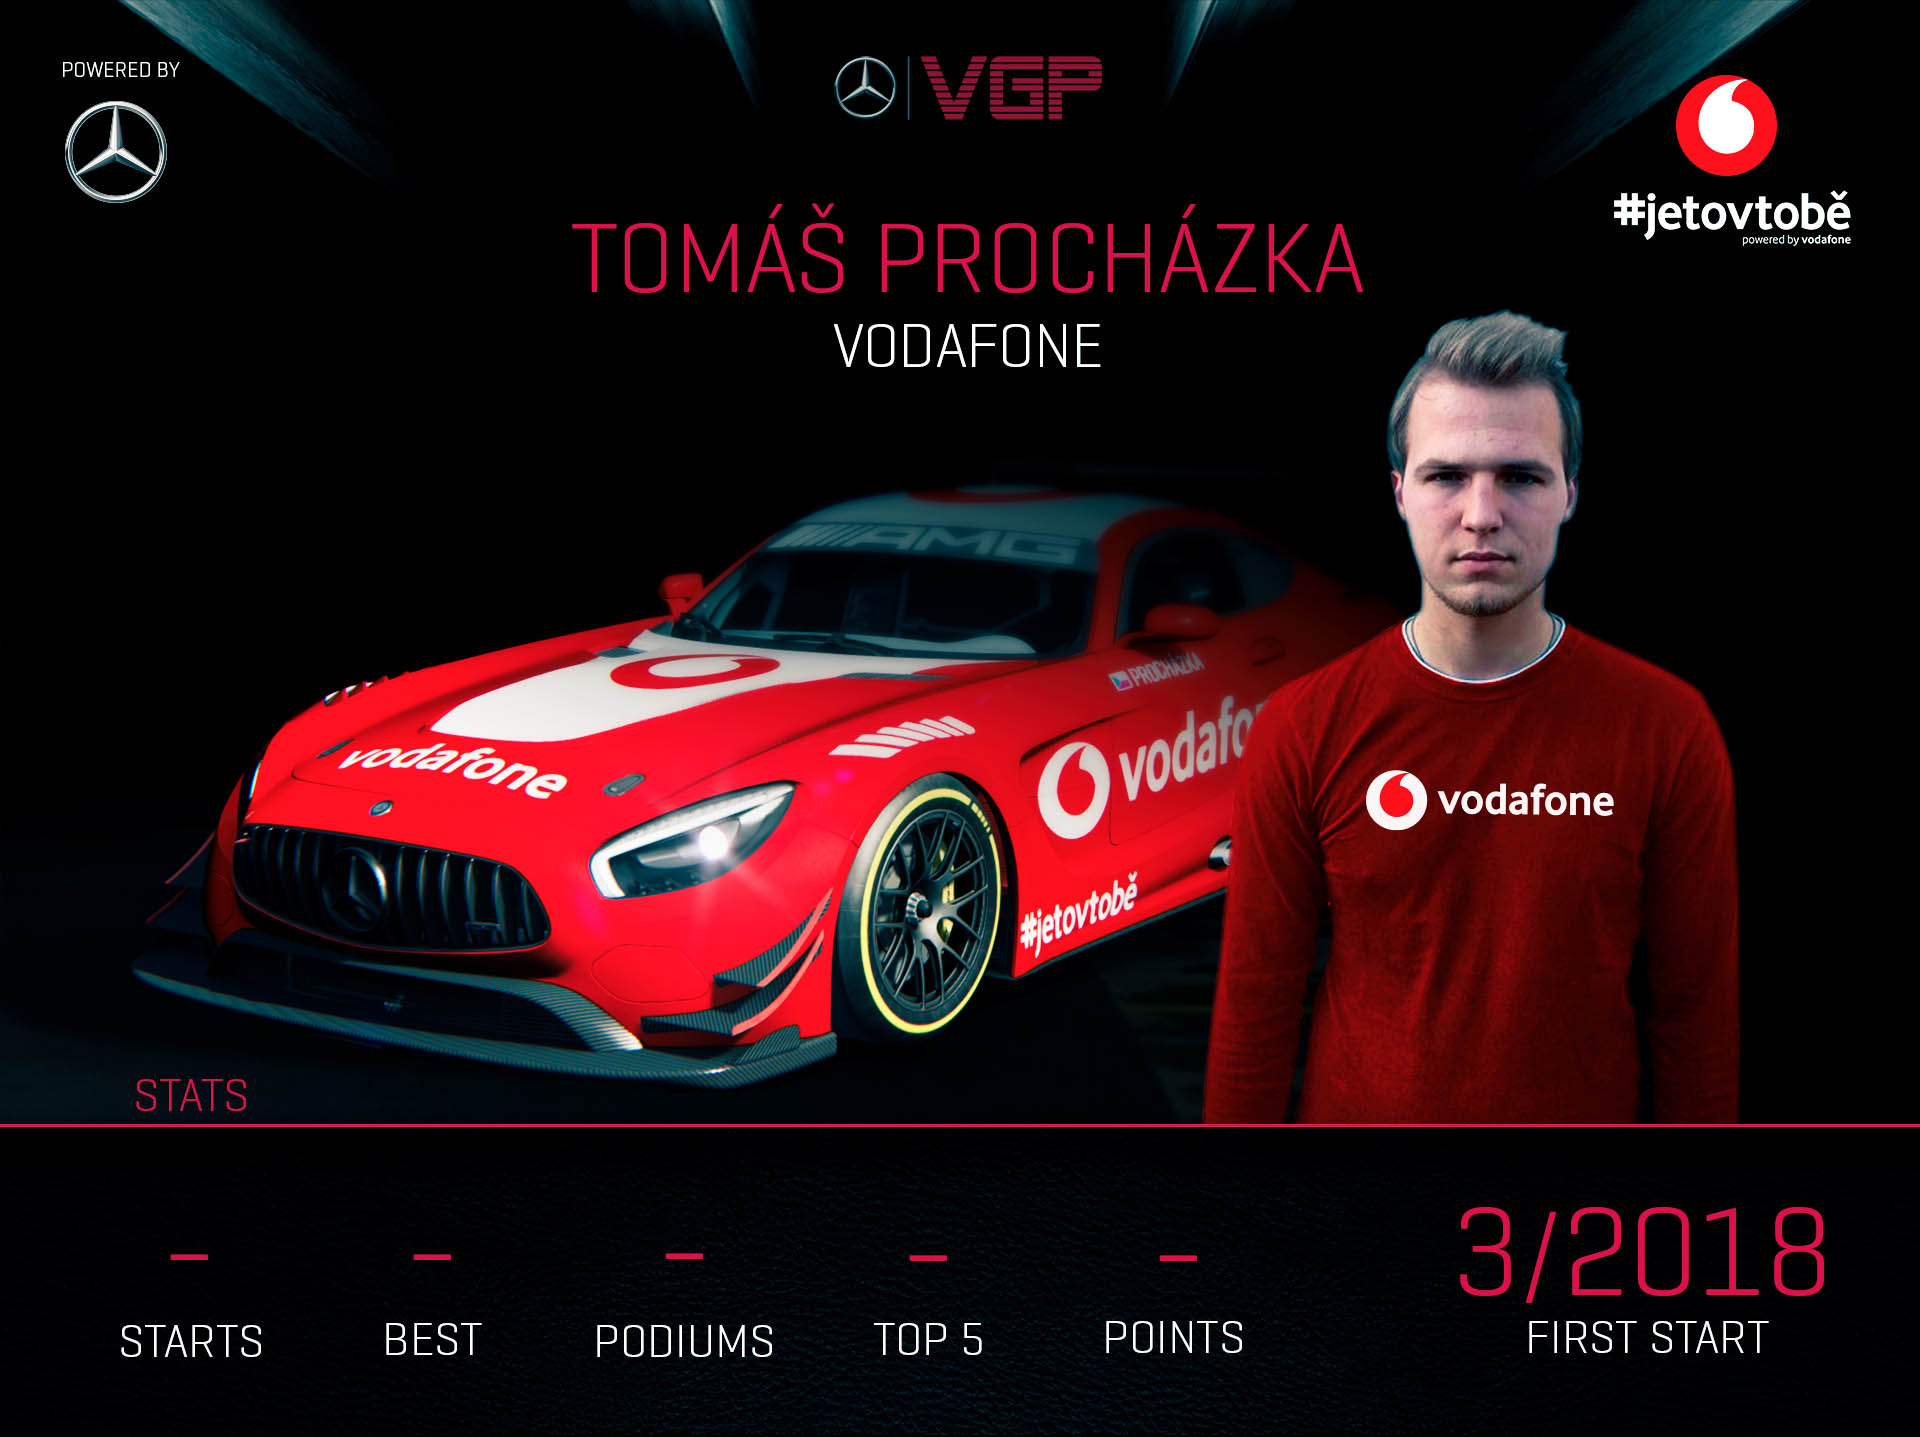 Vodafone Procházka